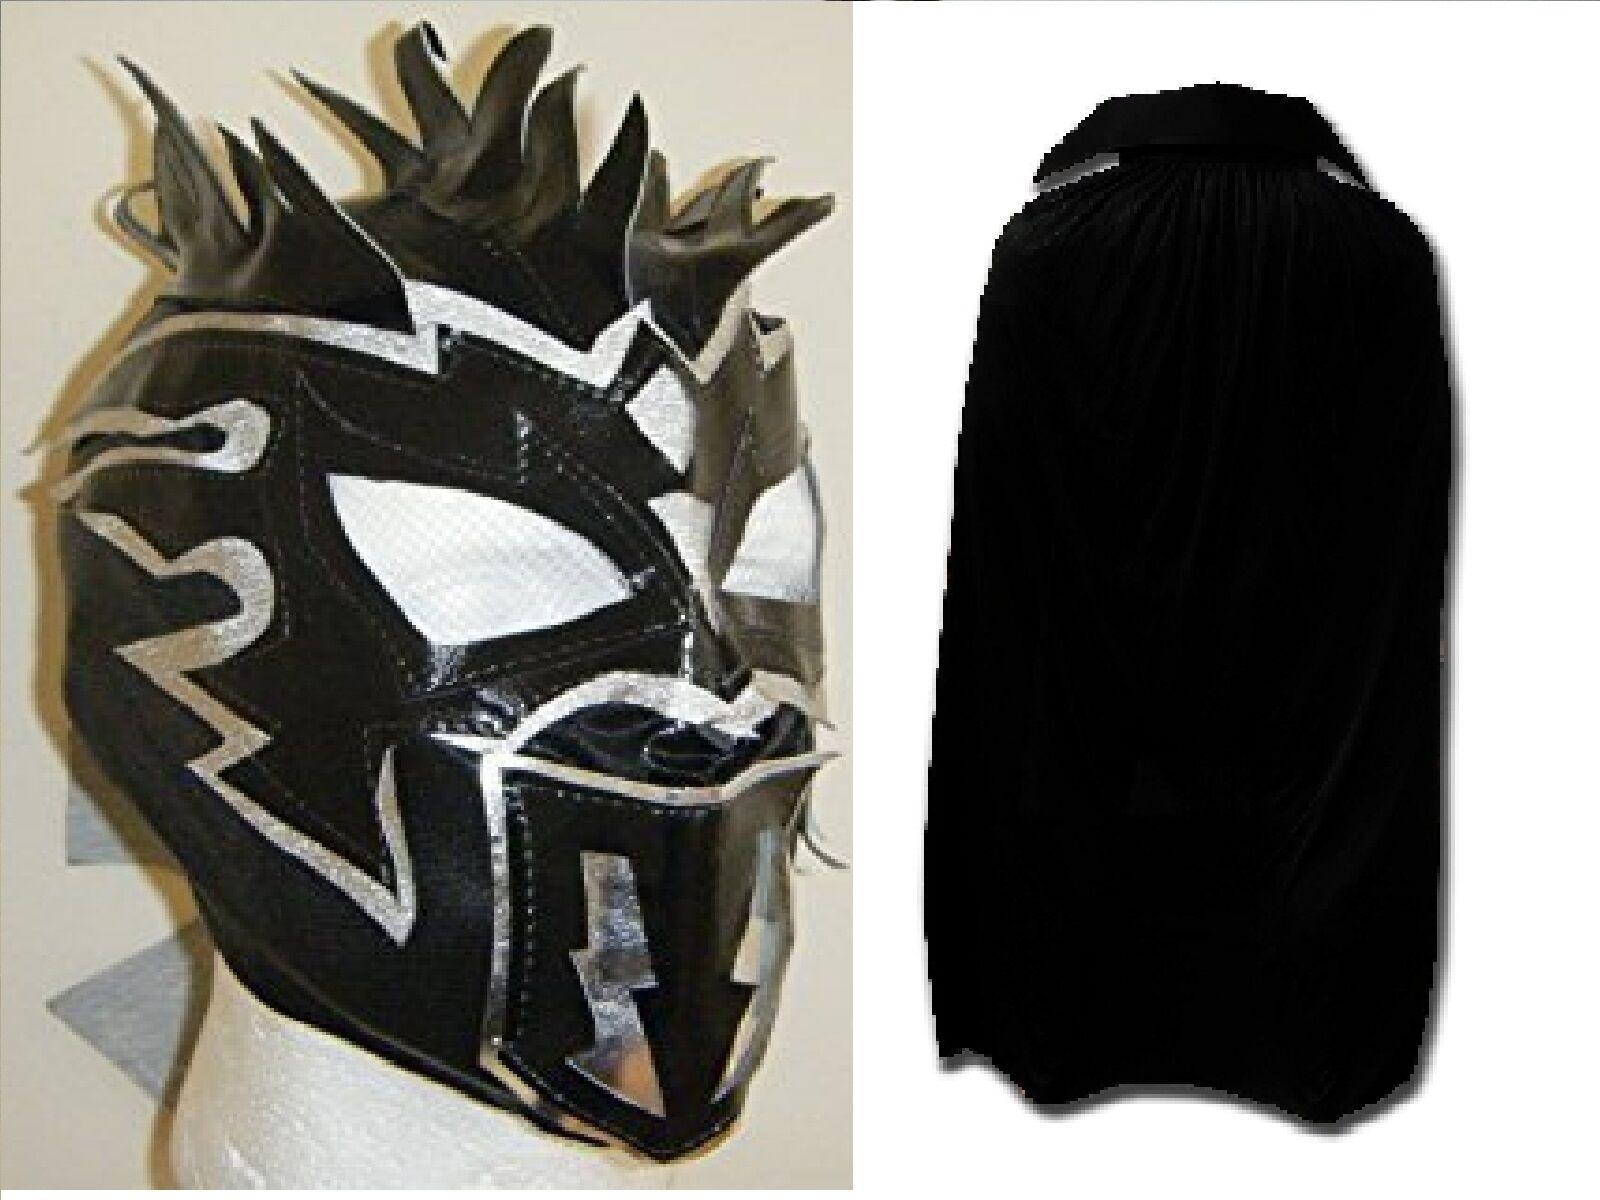 Kalisto Maske Schwarz Umhang Kinder Wrestling Neu Kostüm Cosplay Wwe